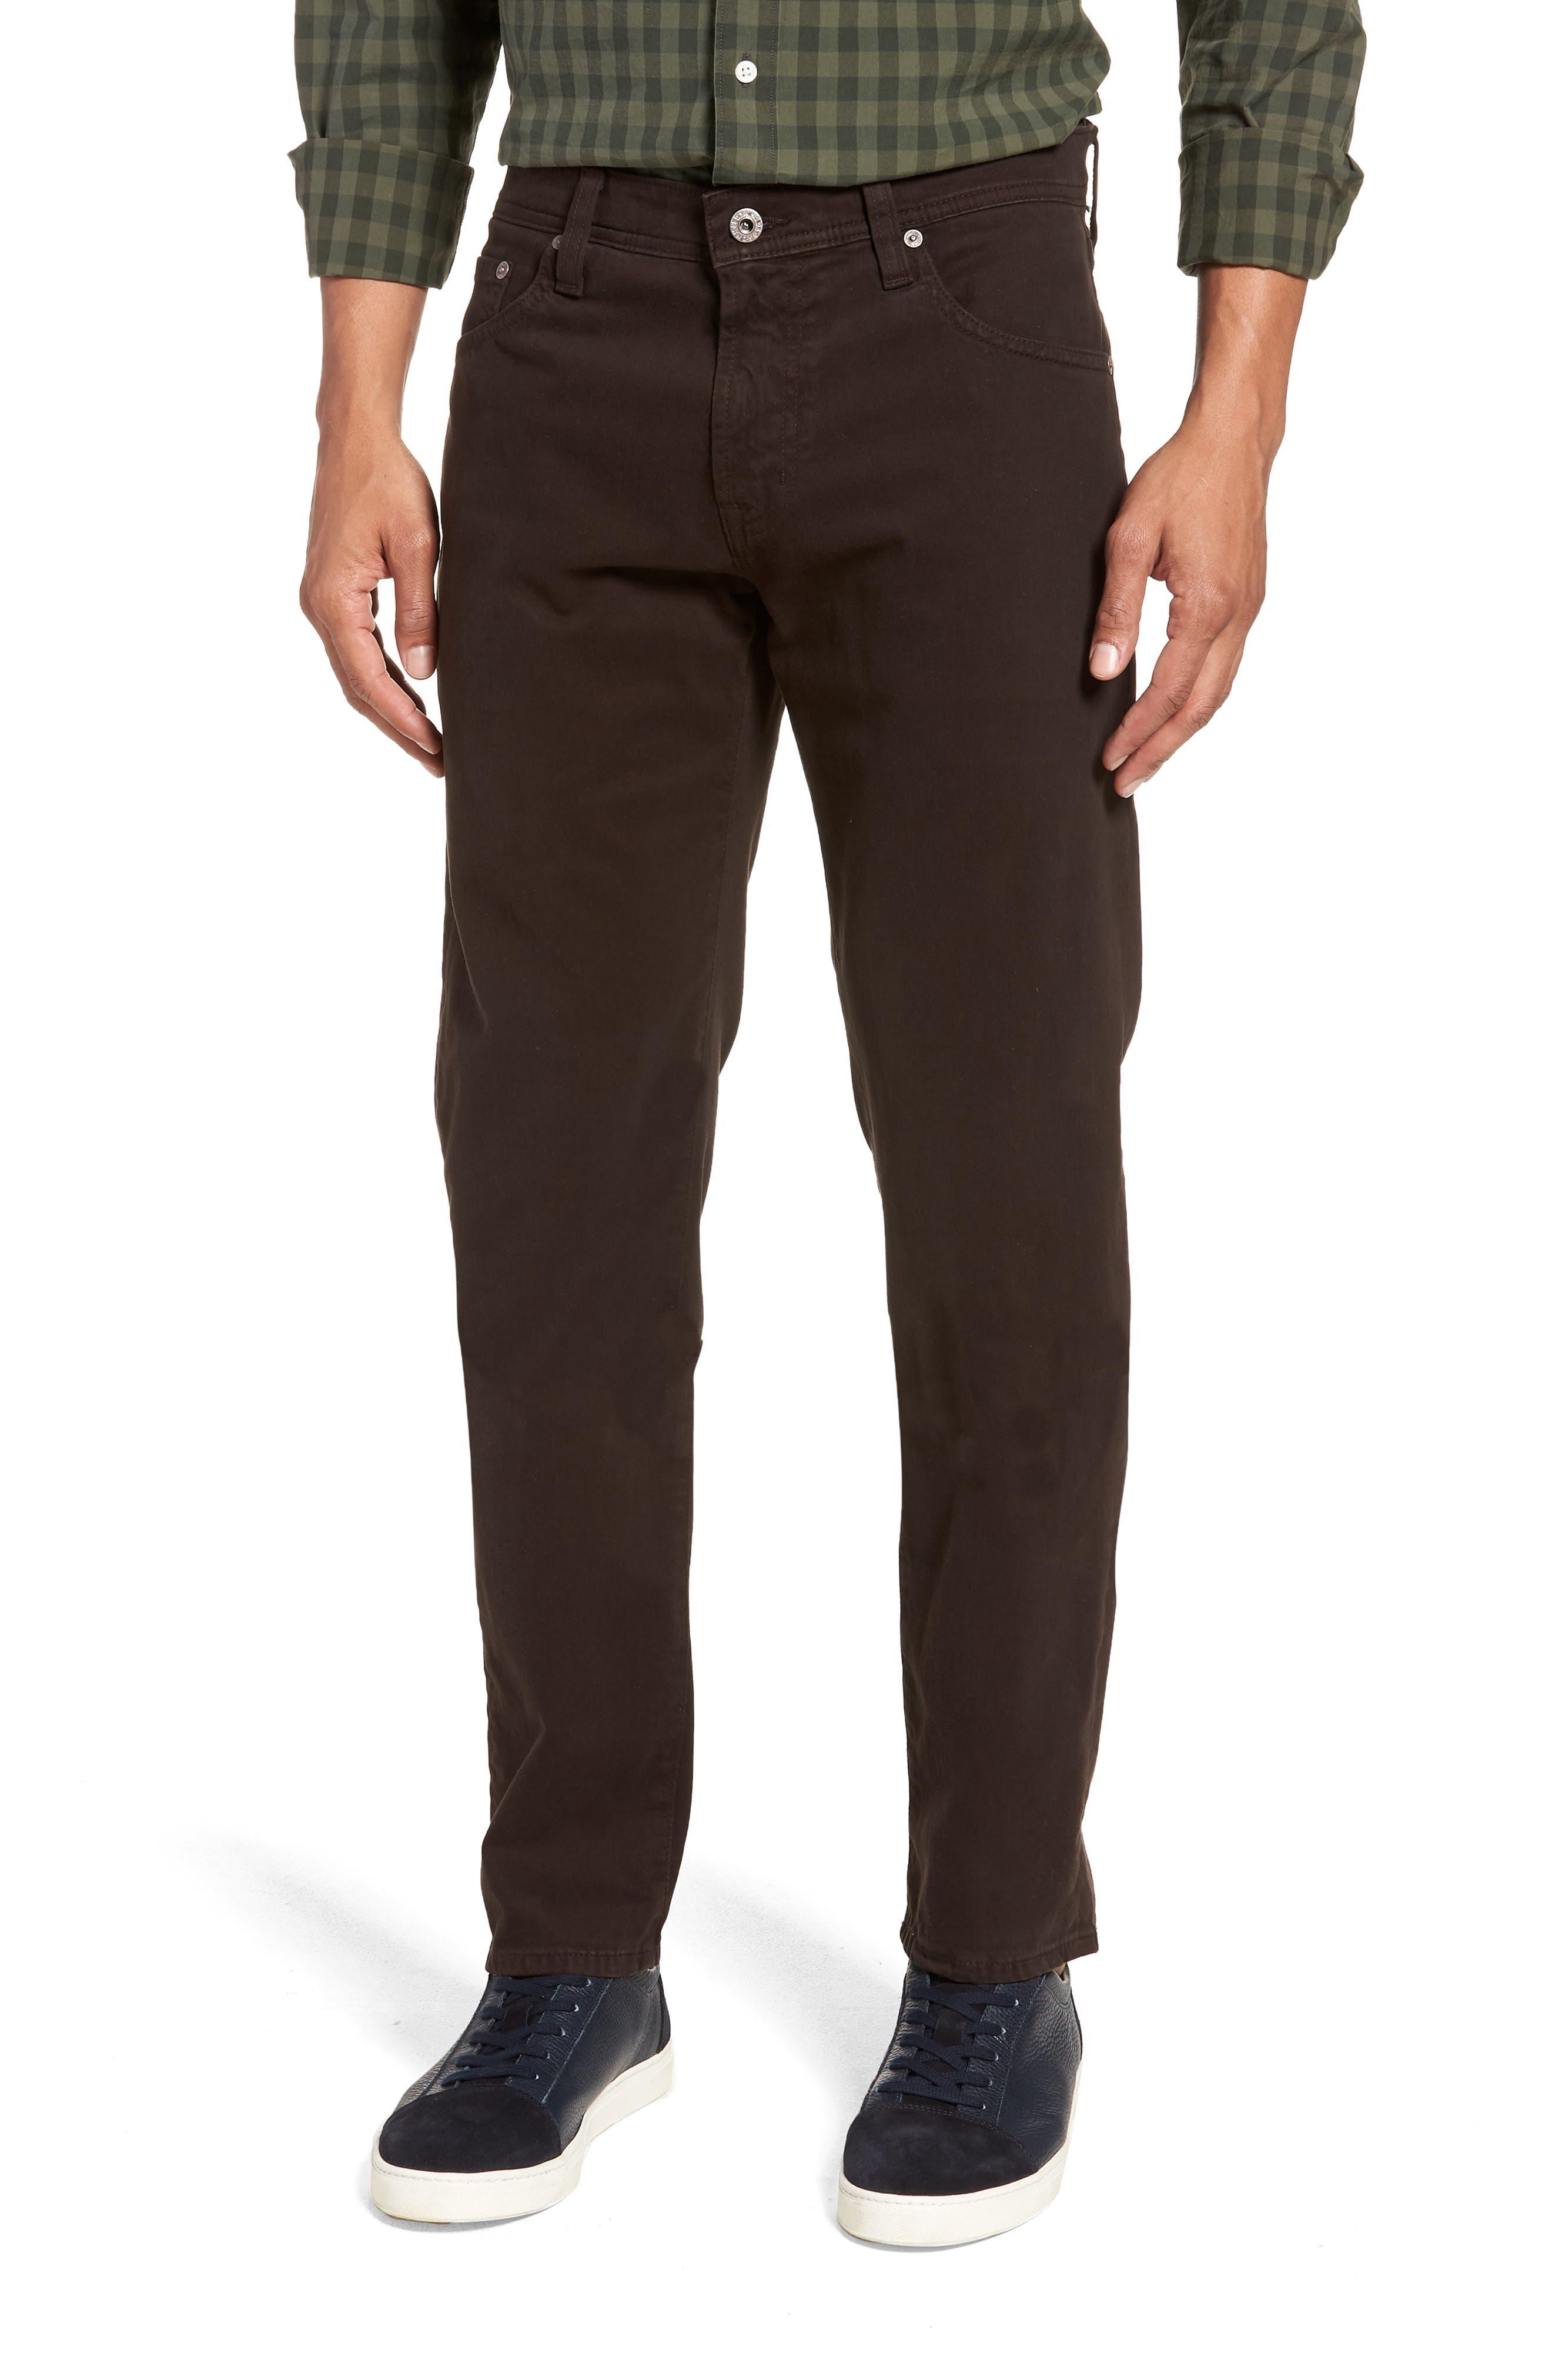 Tellis SUD Modern Slim Stretch Twill Pants,                         Main,                         color, Shutter Brown